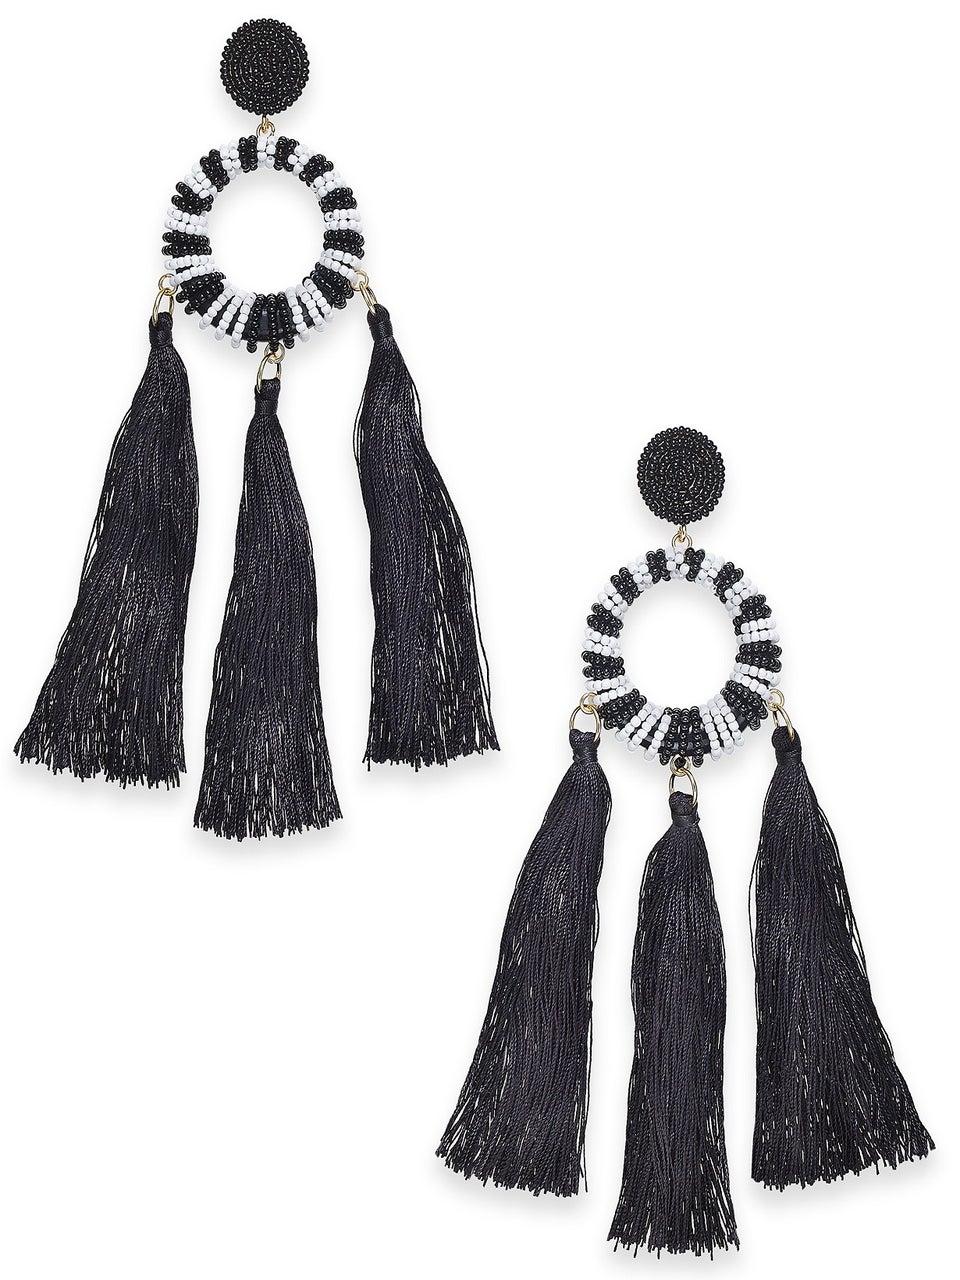 Shop Now! 15 Statement Earrings Under $30